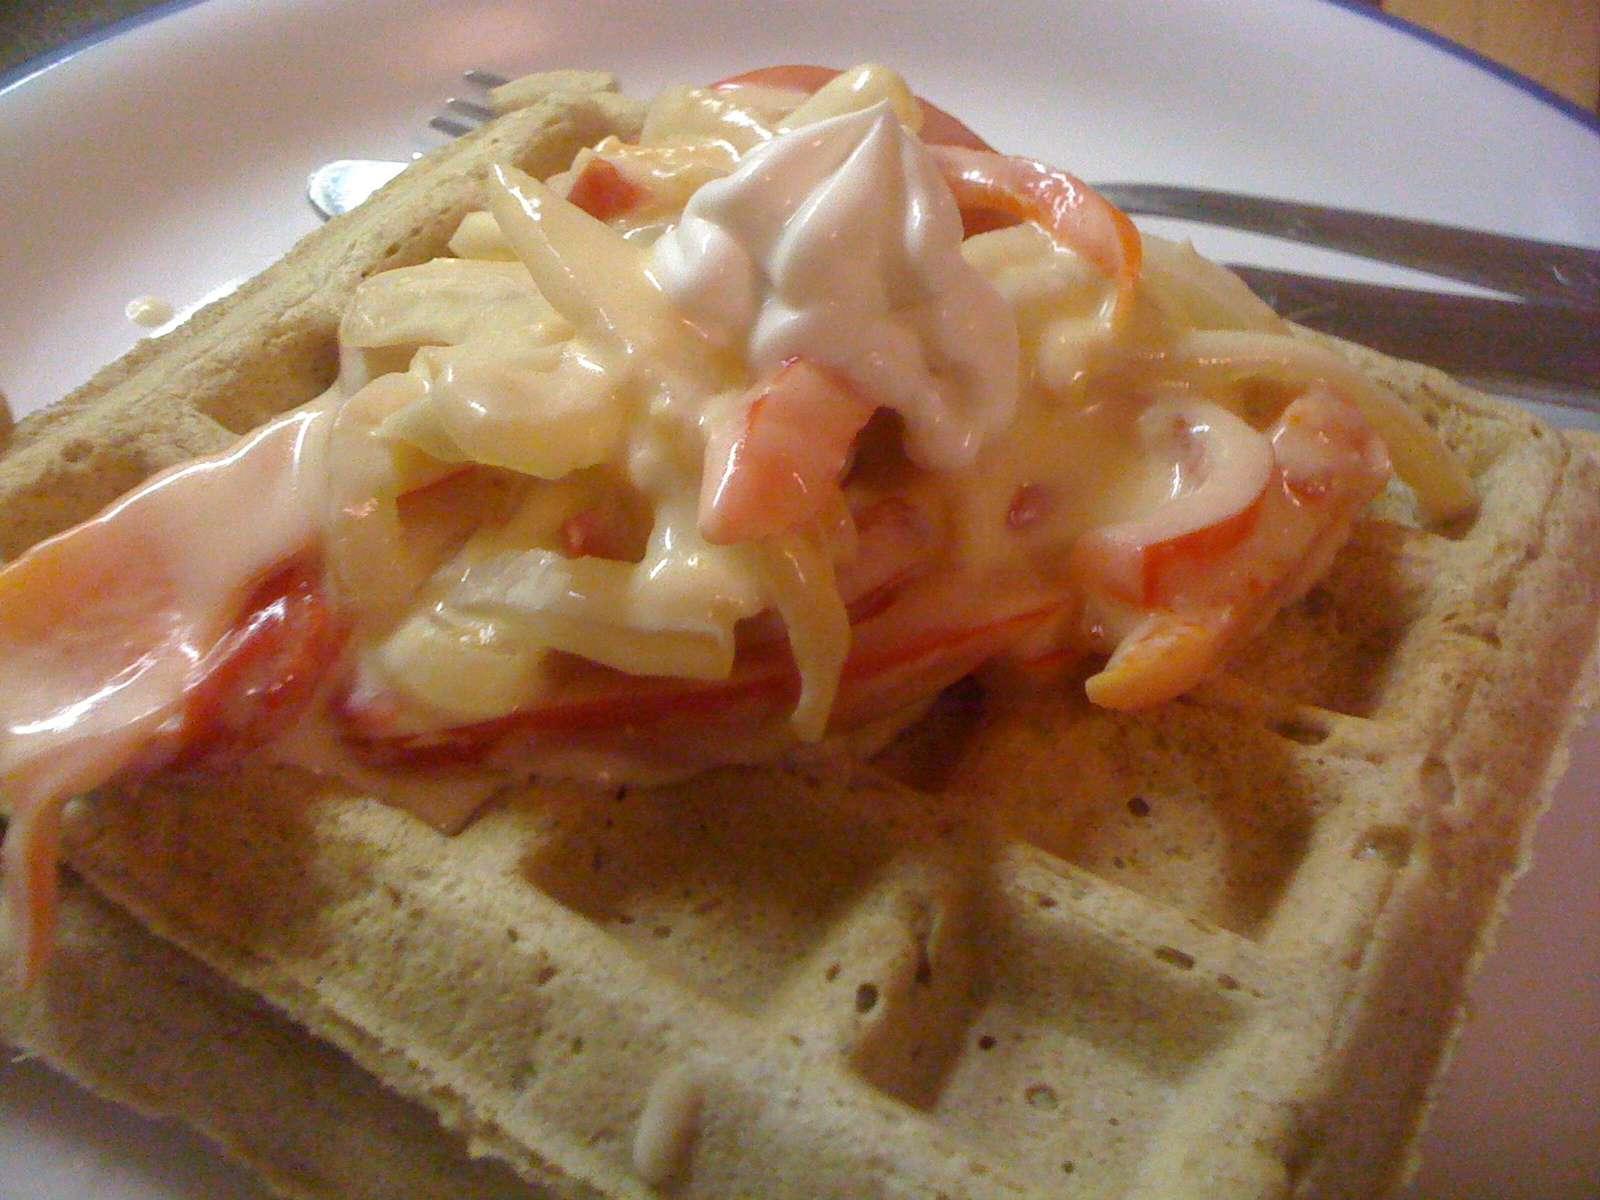 Vegan Rosemary garlic waffle with sautéed veggies and Tofutti sour cream